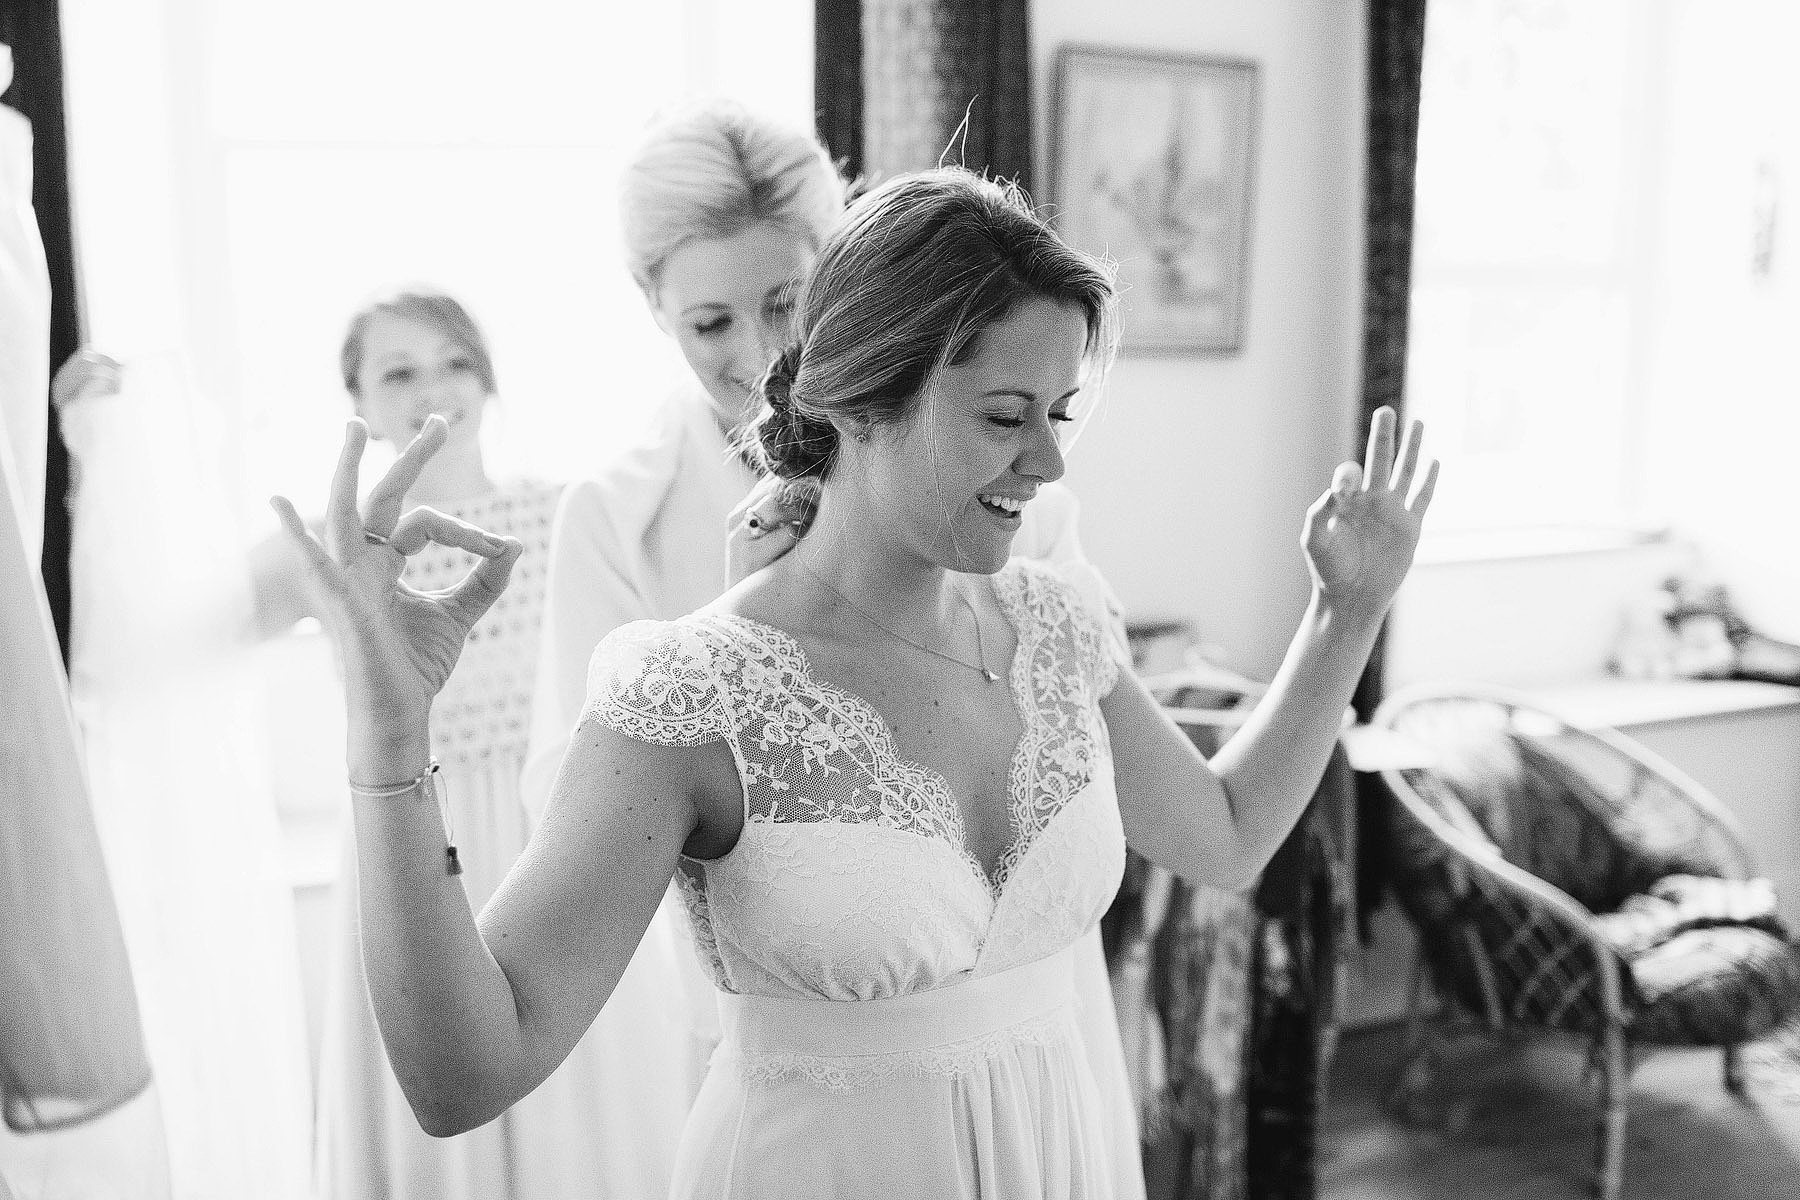 Black and White Documentary Wedding Photography